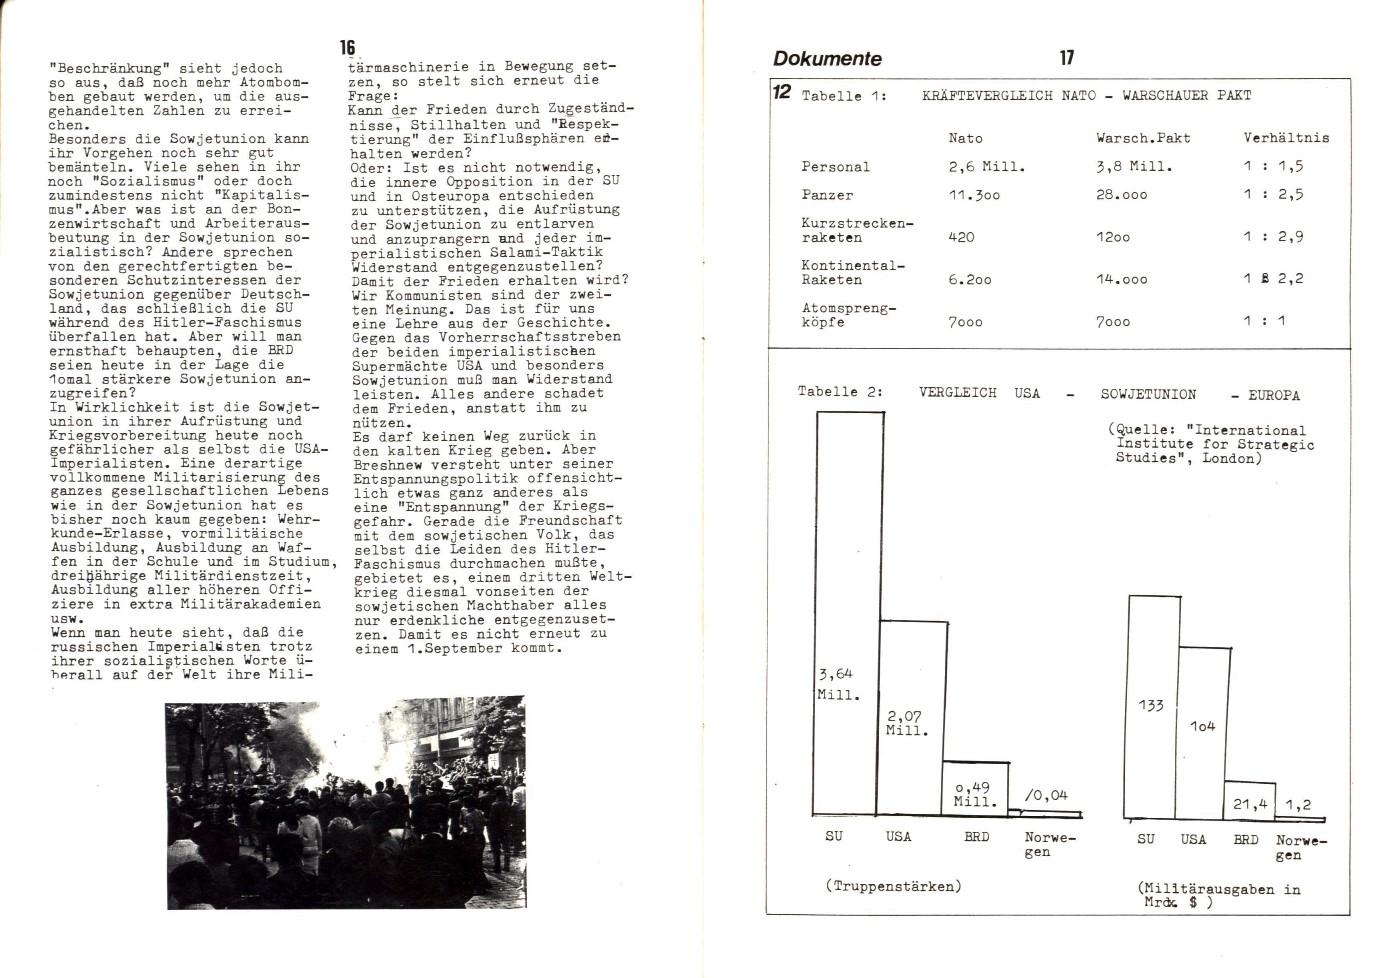 KJVD_1979_Dokumente_zum_Antikriegstag_10